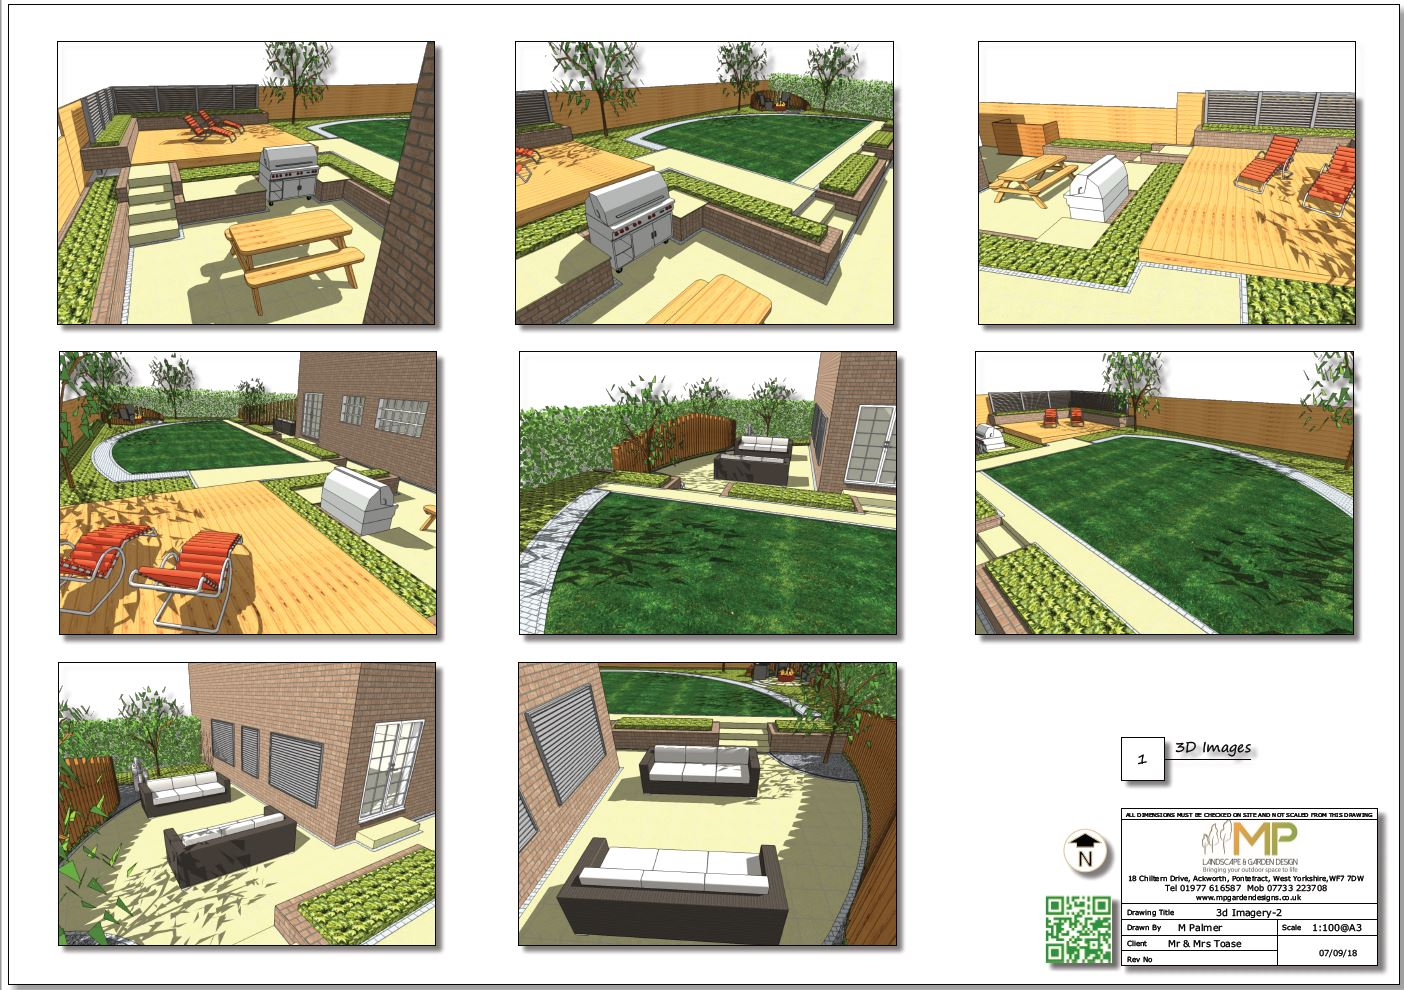 Garden design concept plan - 2 3D images  for a rear garden in Wakefield